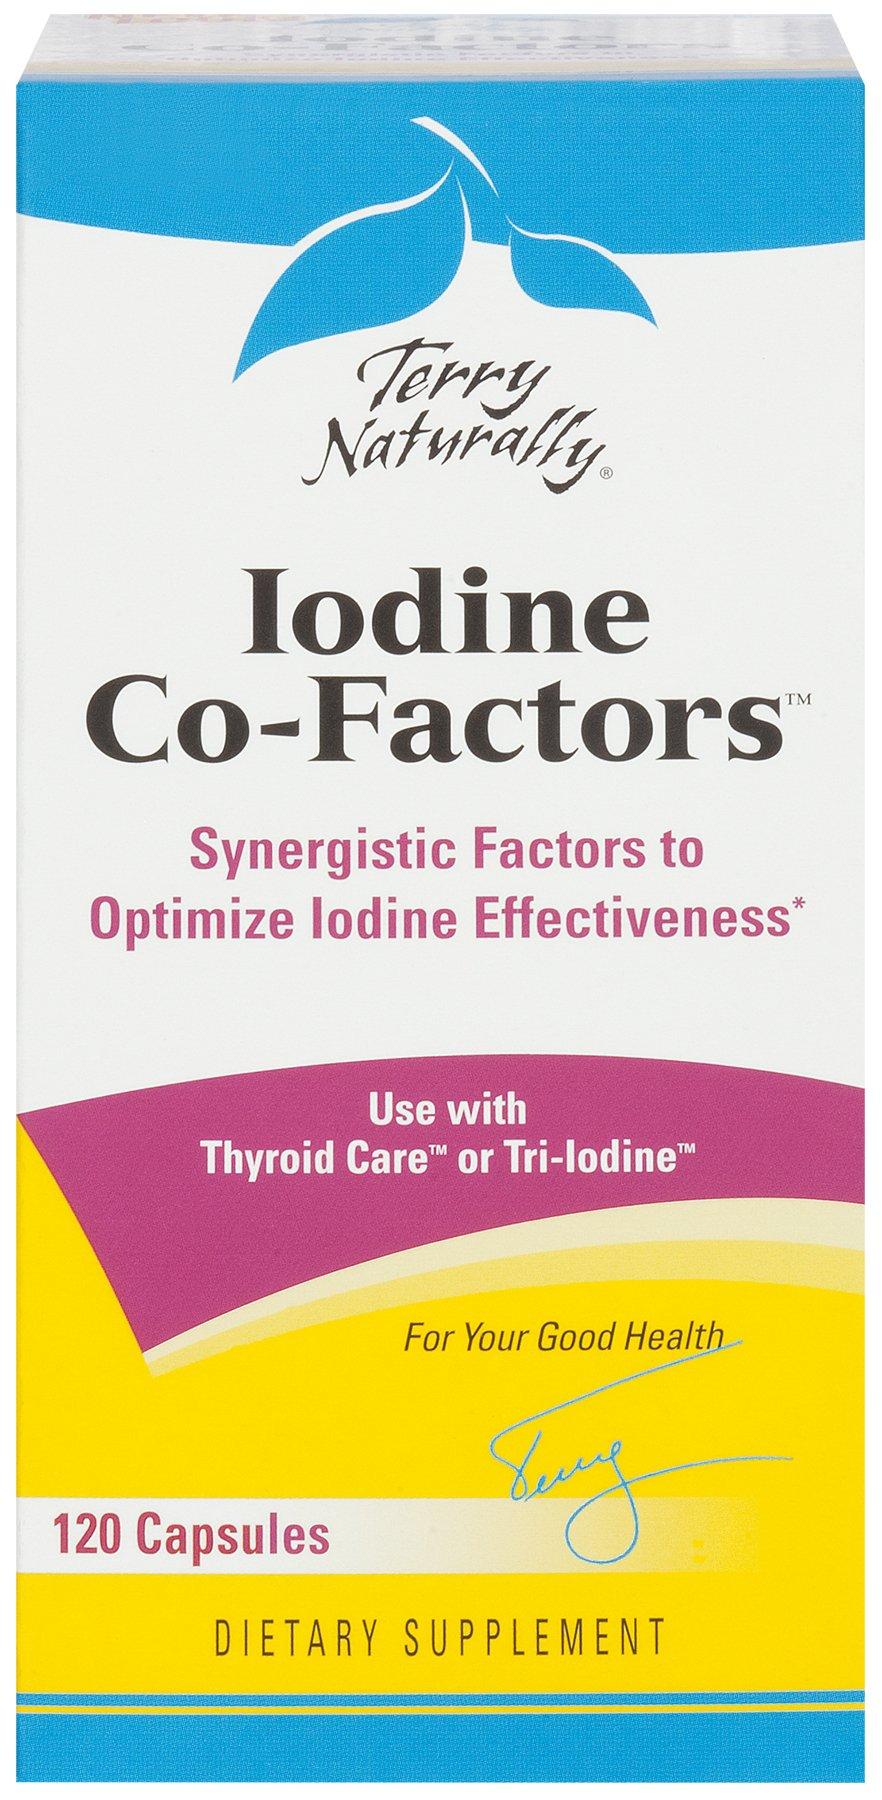 Terry Naturally Iodine Co-Factors - 120 Capsules